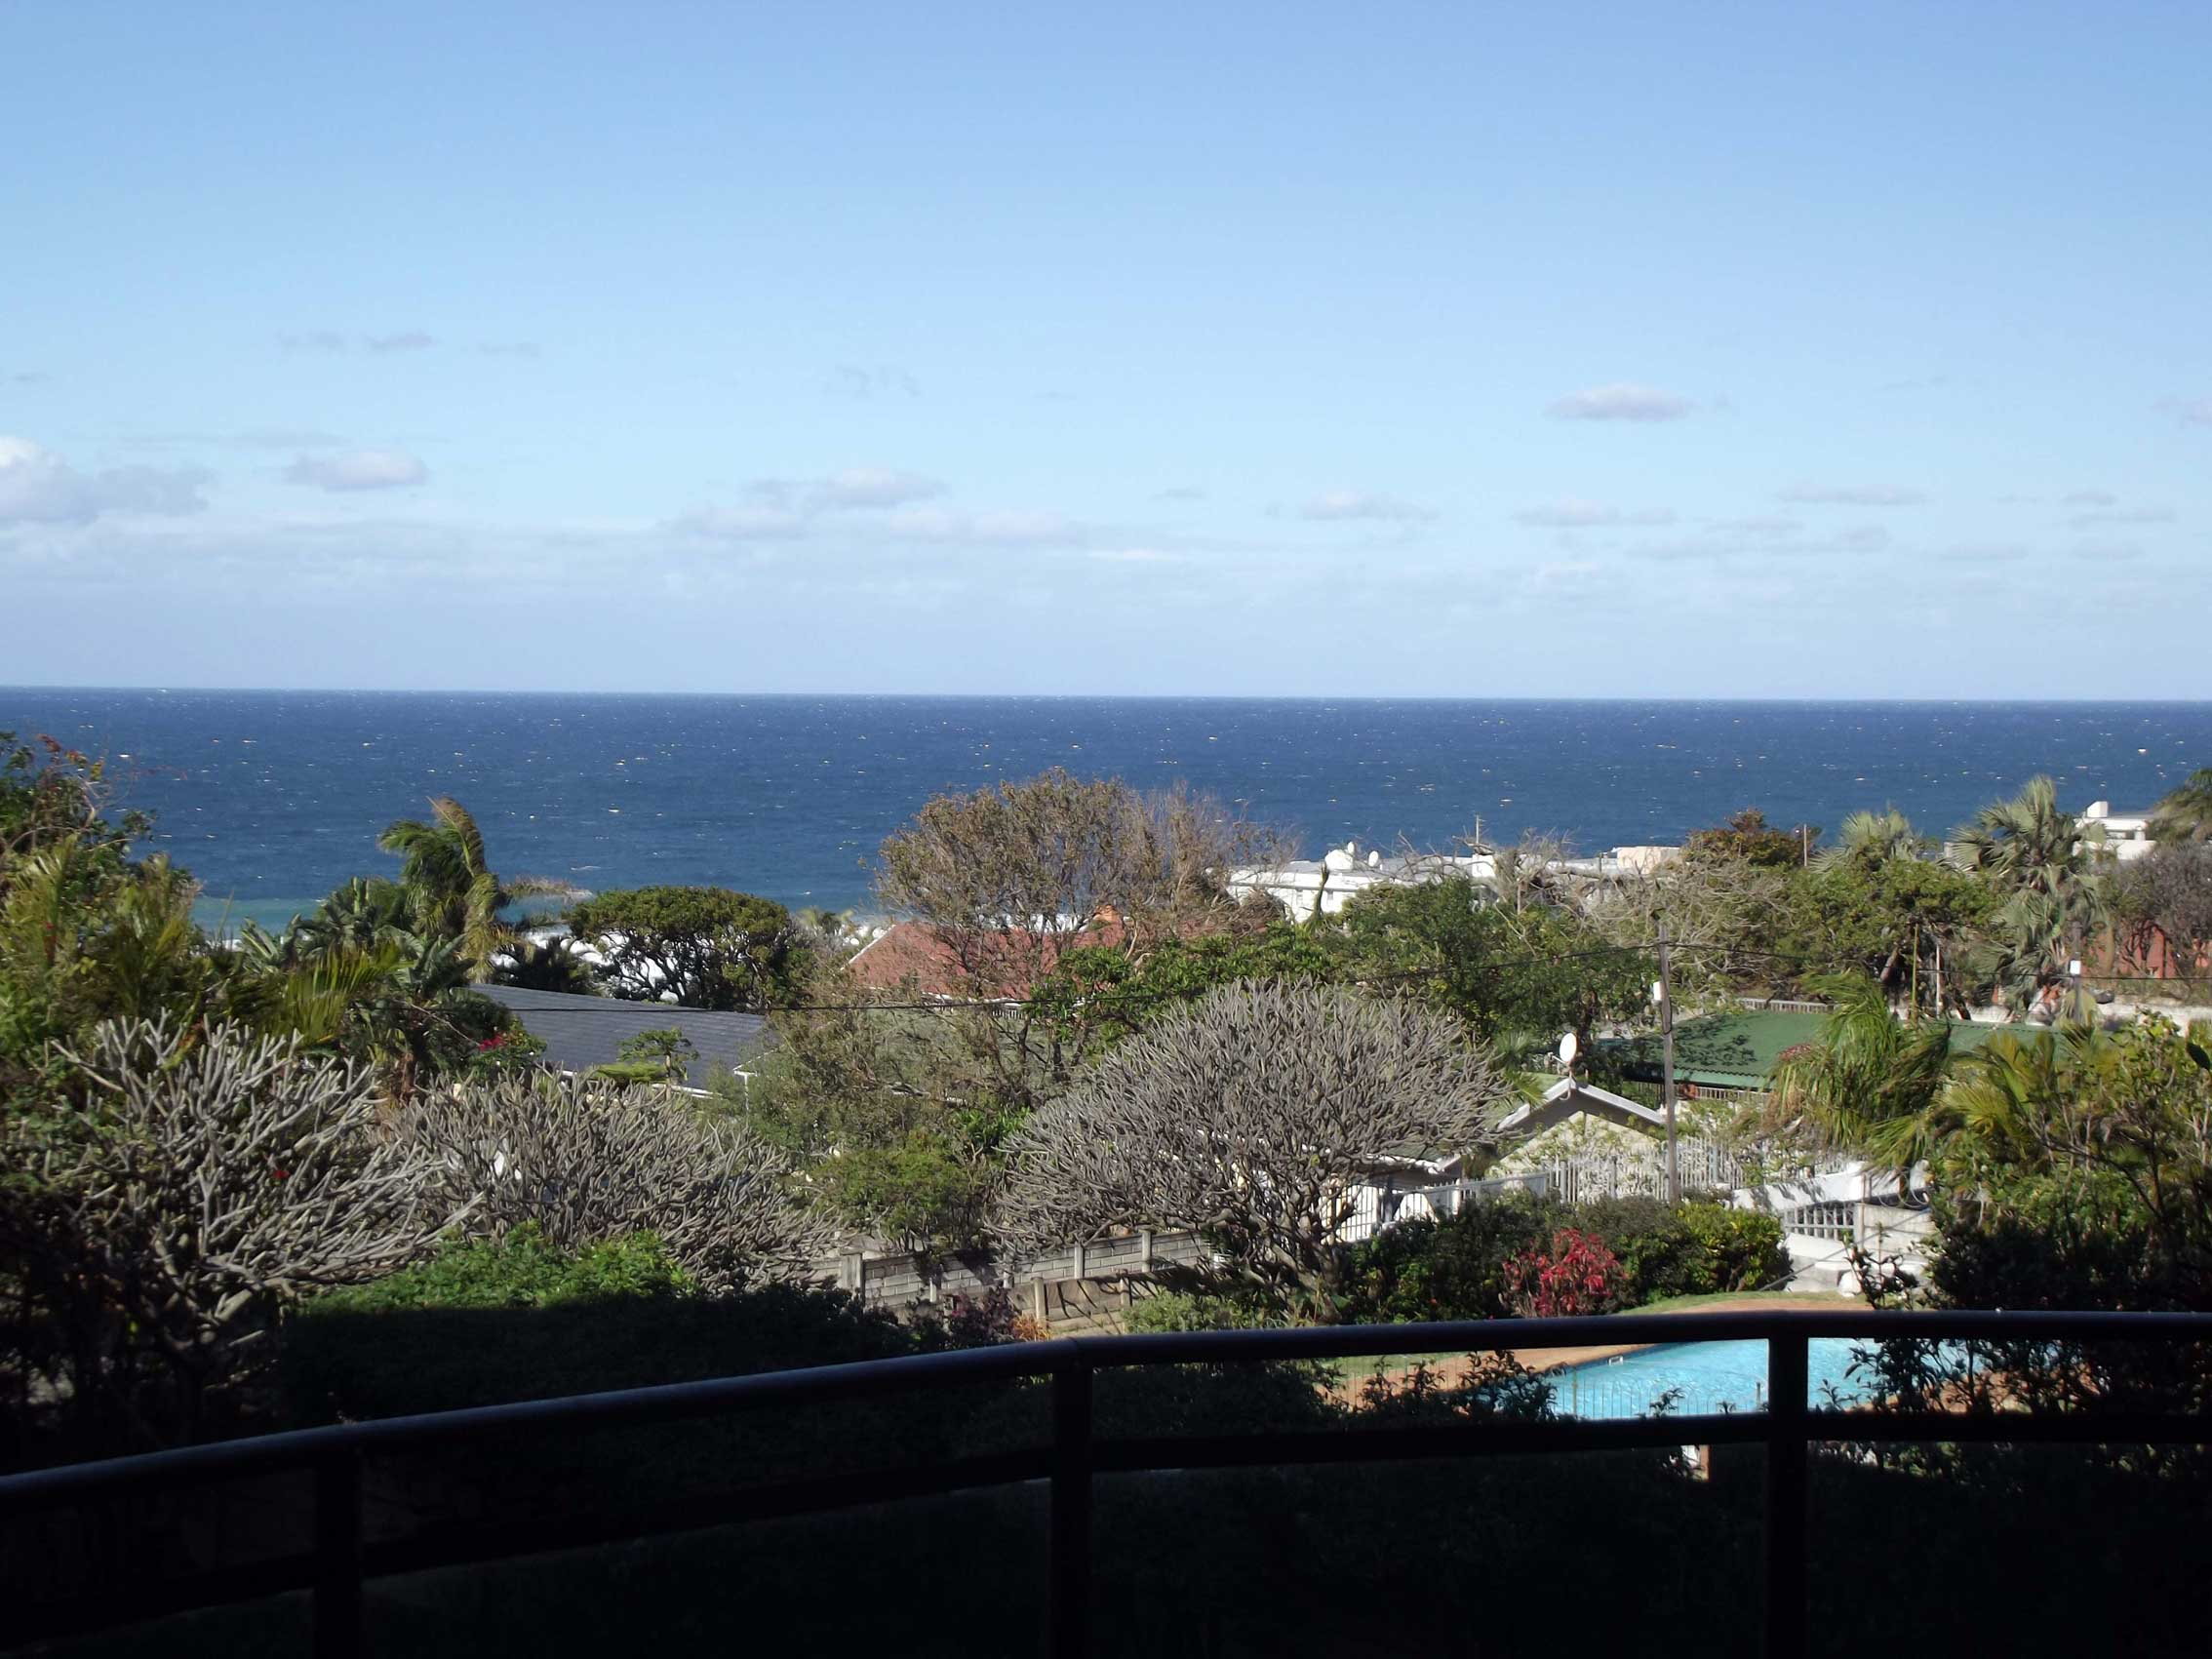 Bonamic 3 - Manaba Beach - Self Catering - Accommodation - Sleeps 6